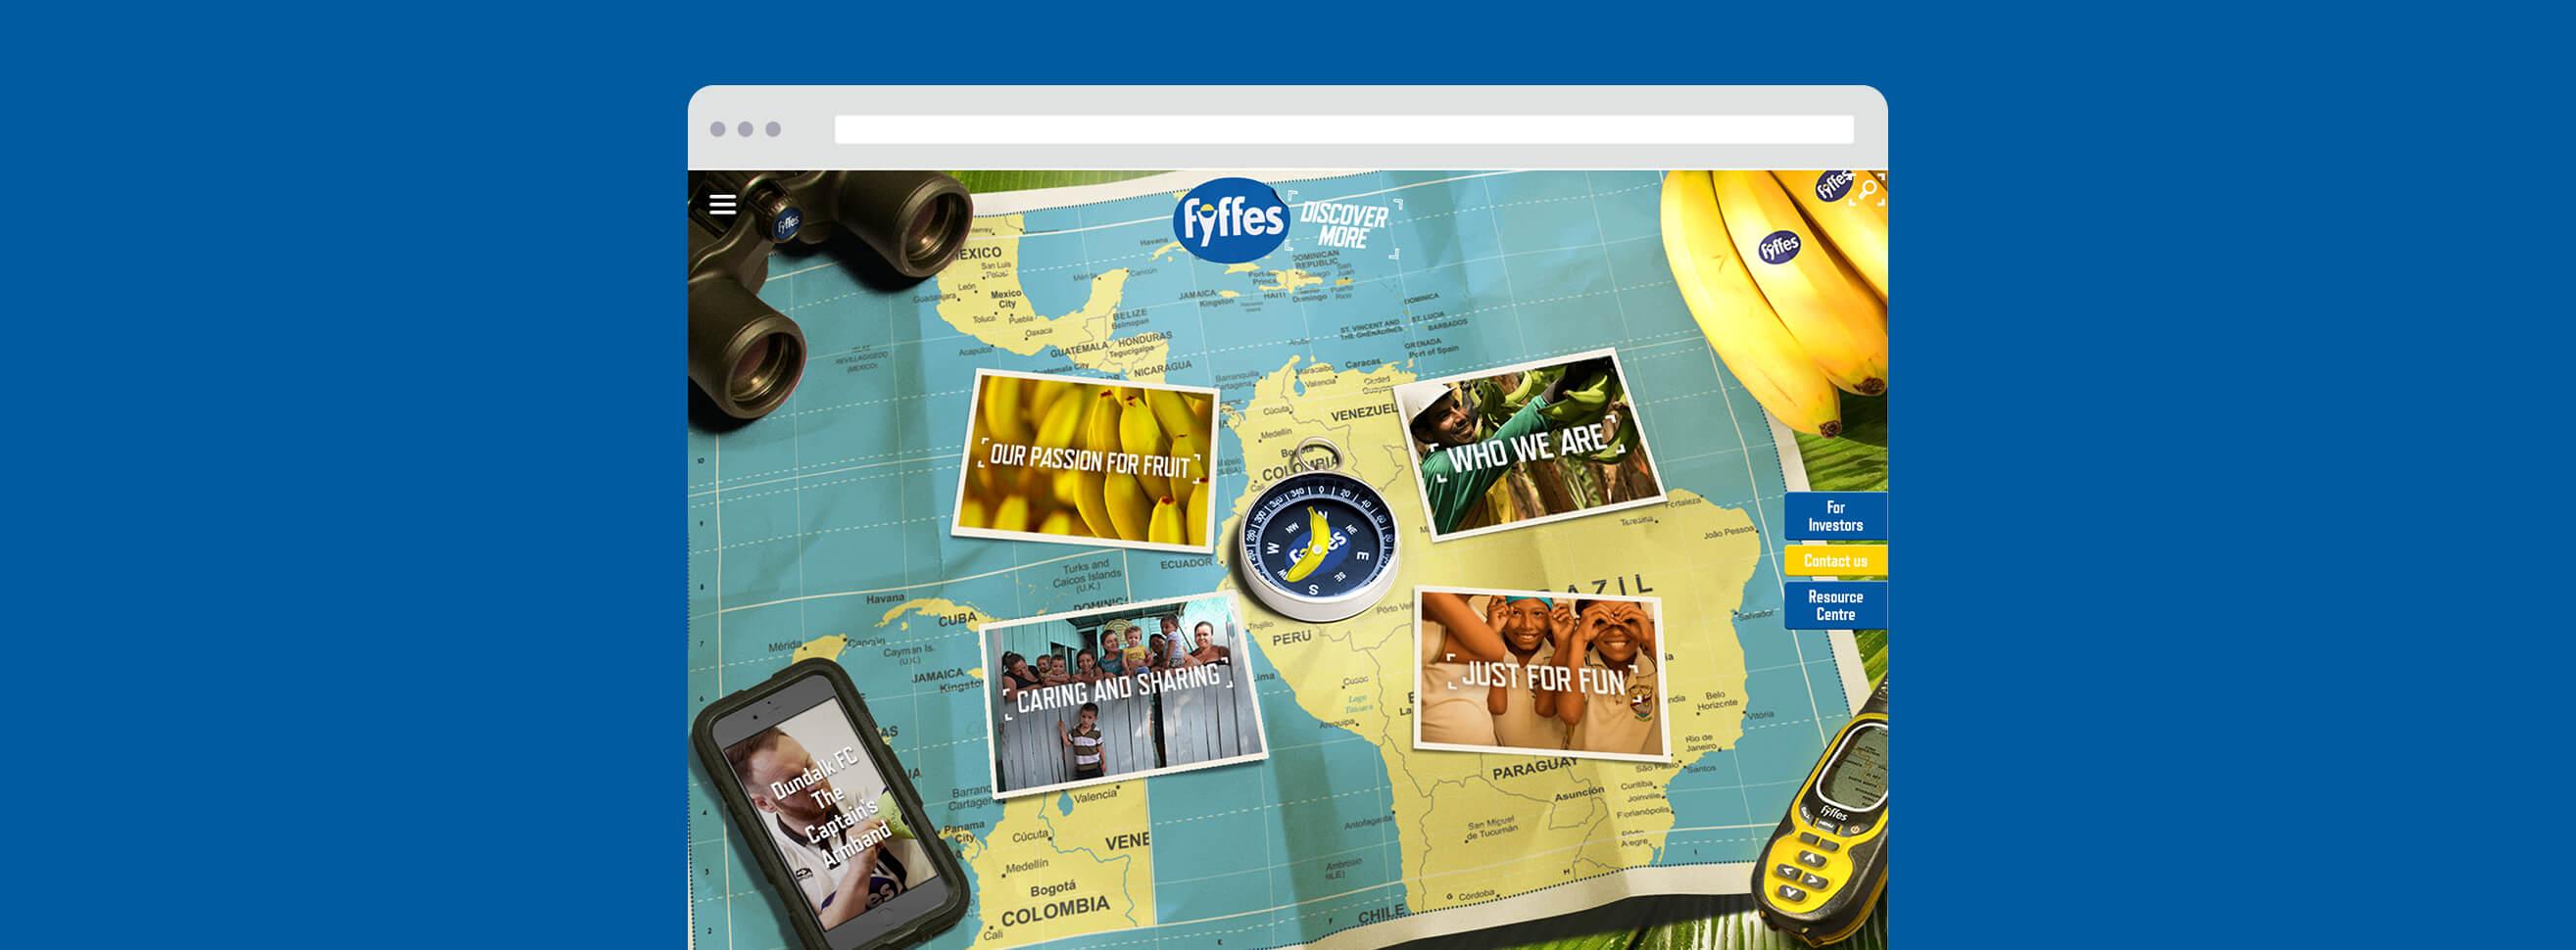 00 - Fyffes  Portfolio LayoutArtboard 40 copy